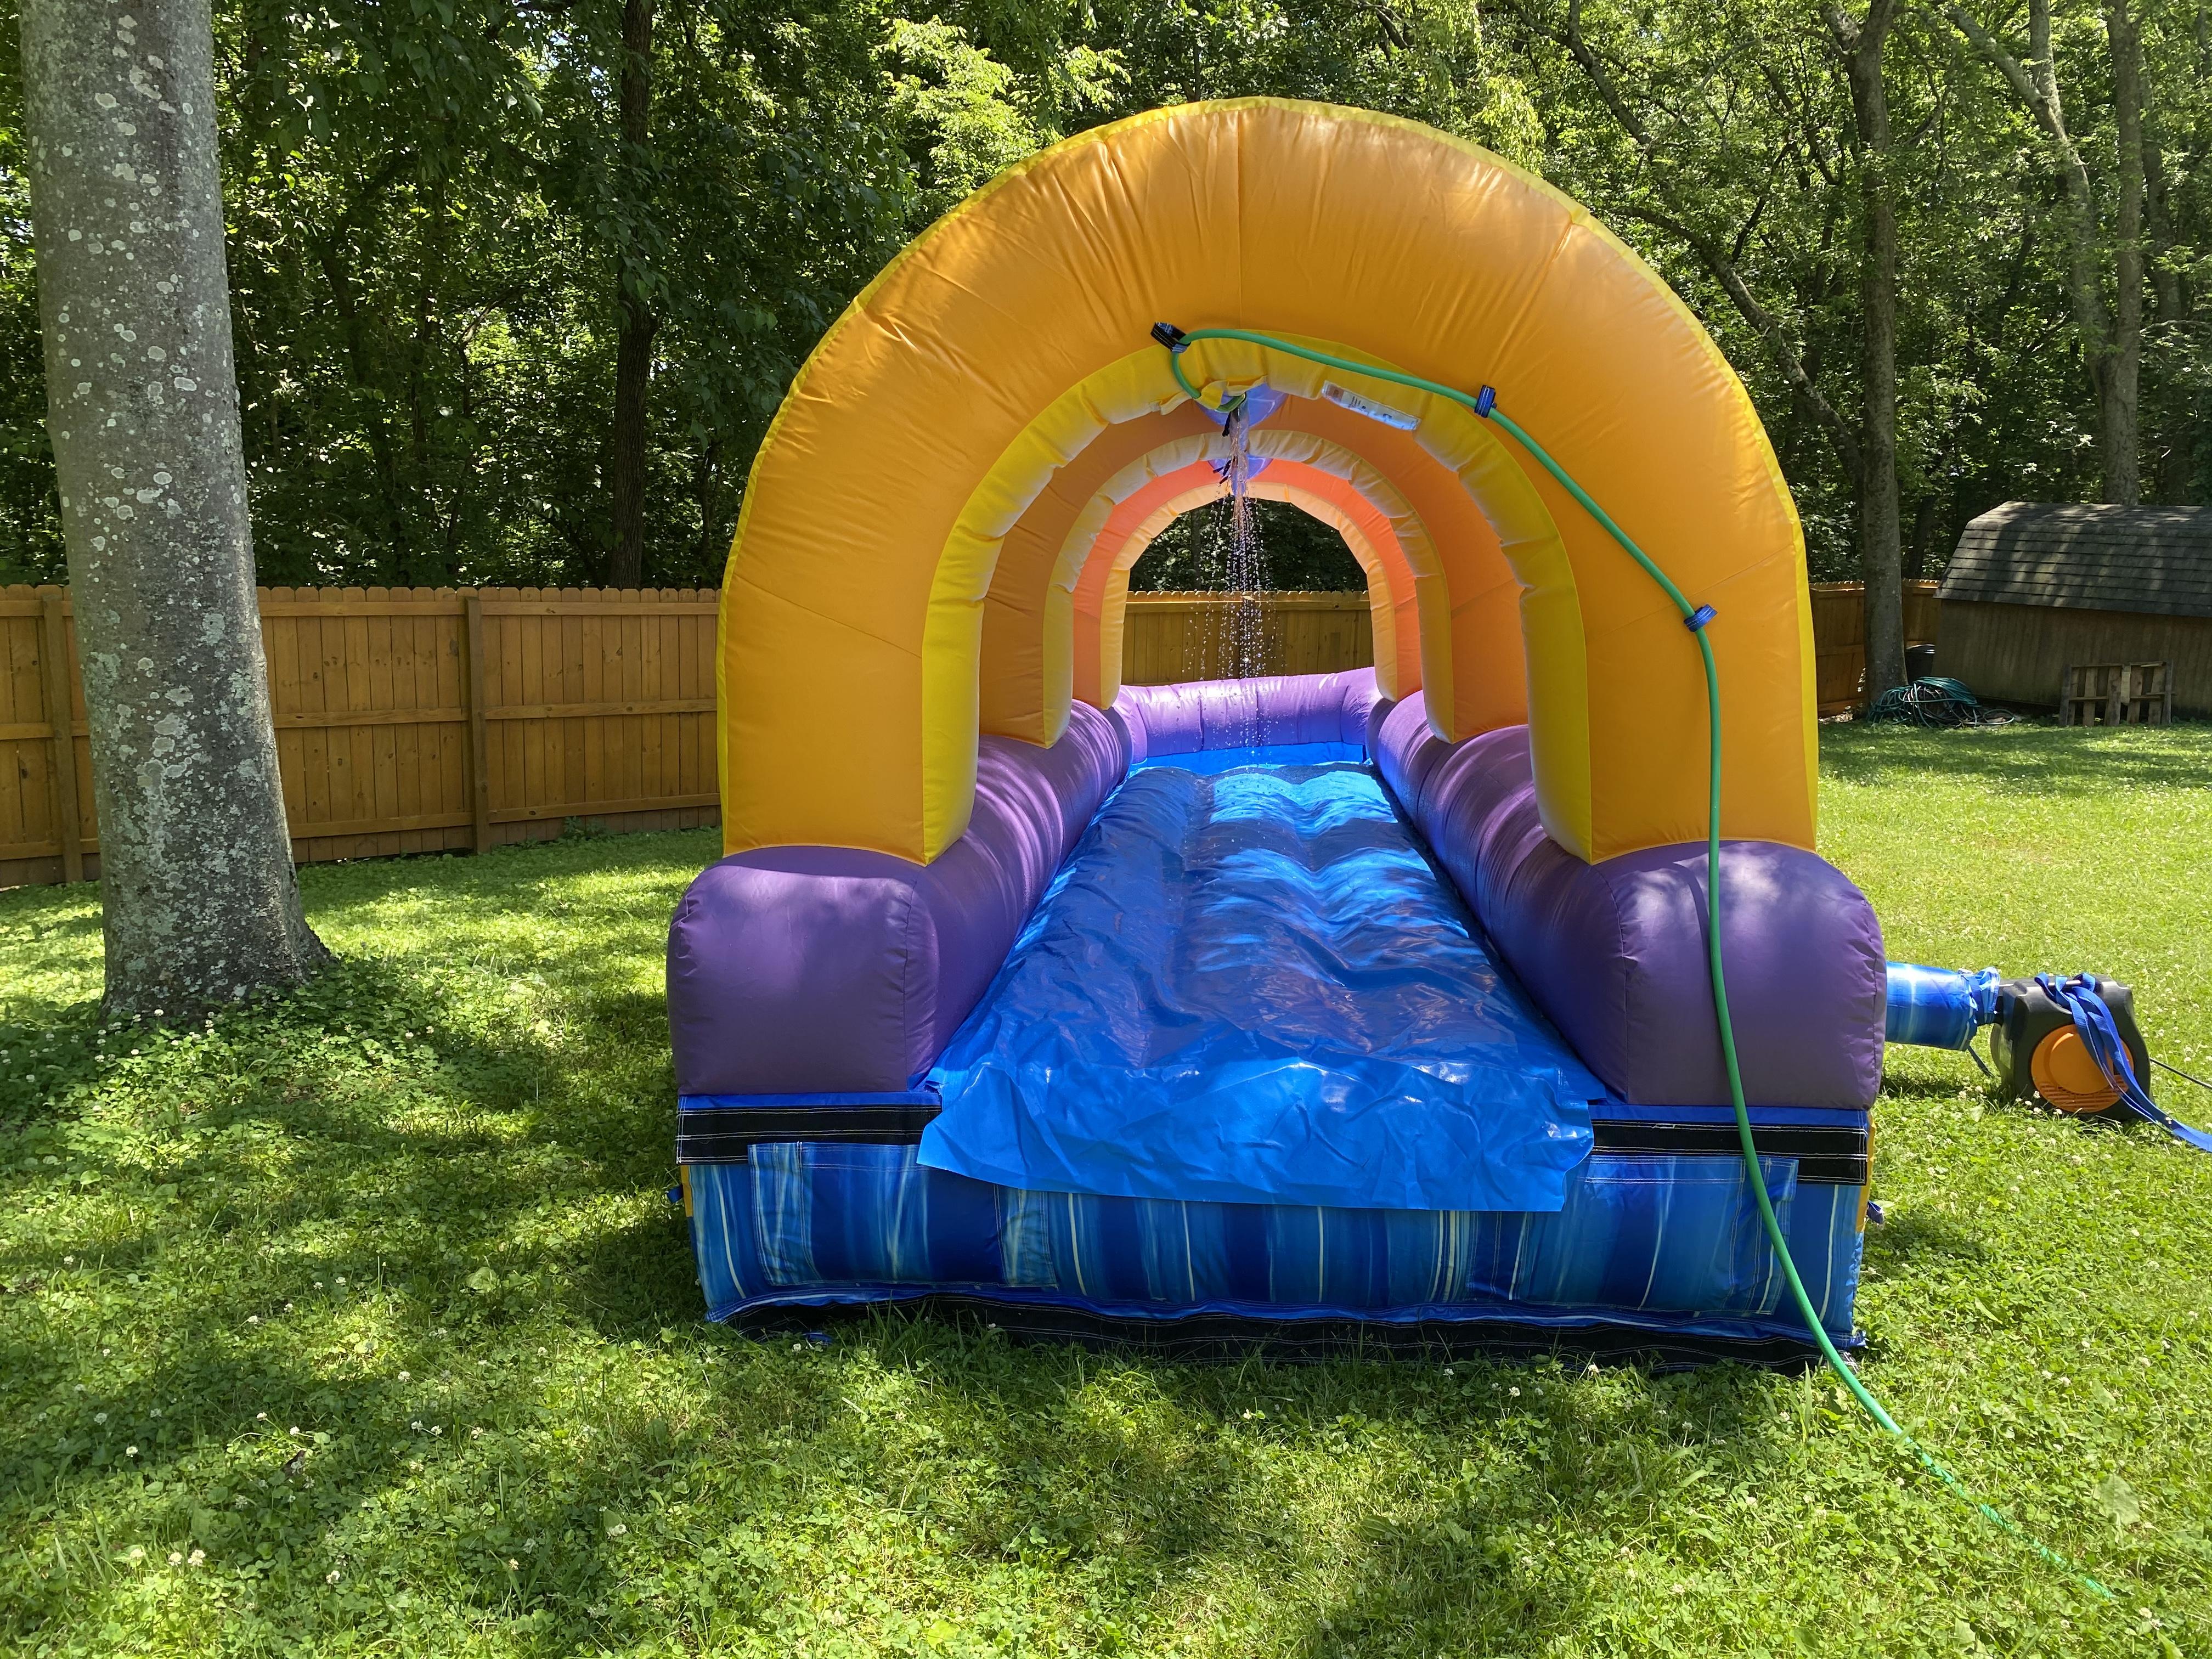 Backyard Slip n Slide - Inflatable Bounce Houses & Water ...